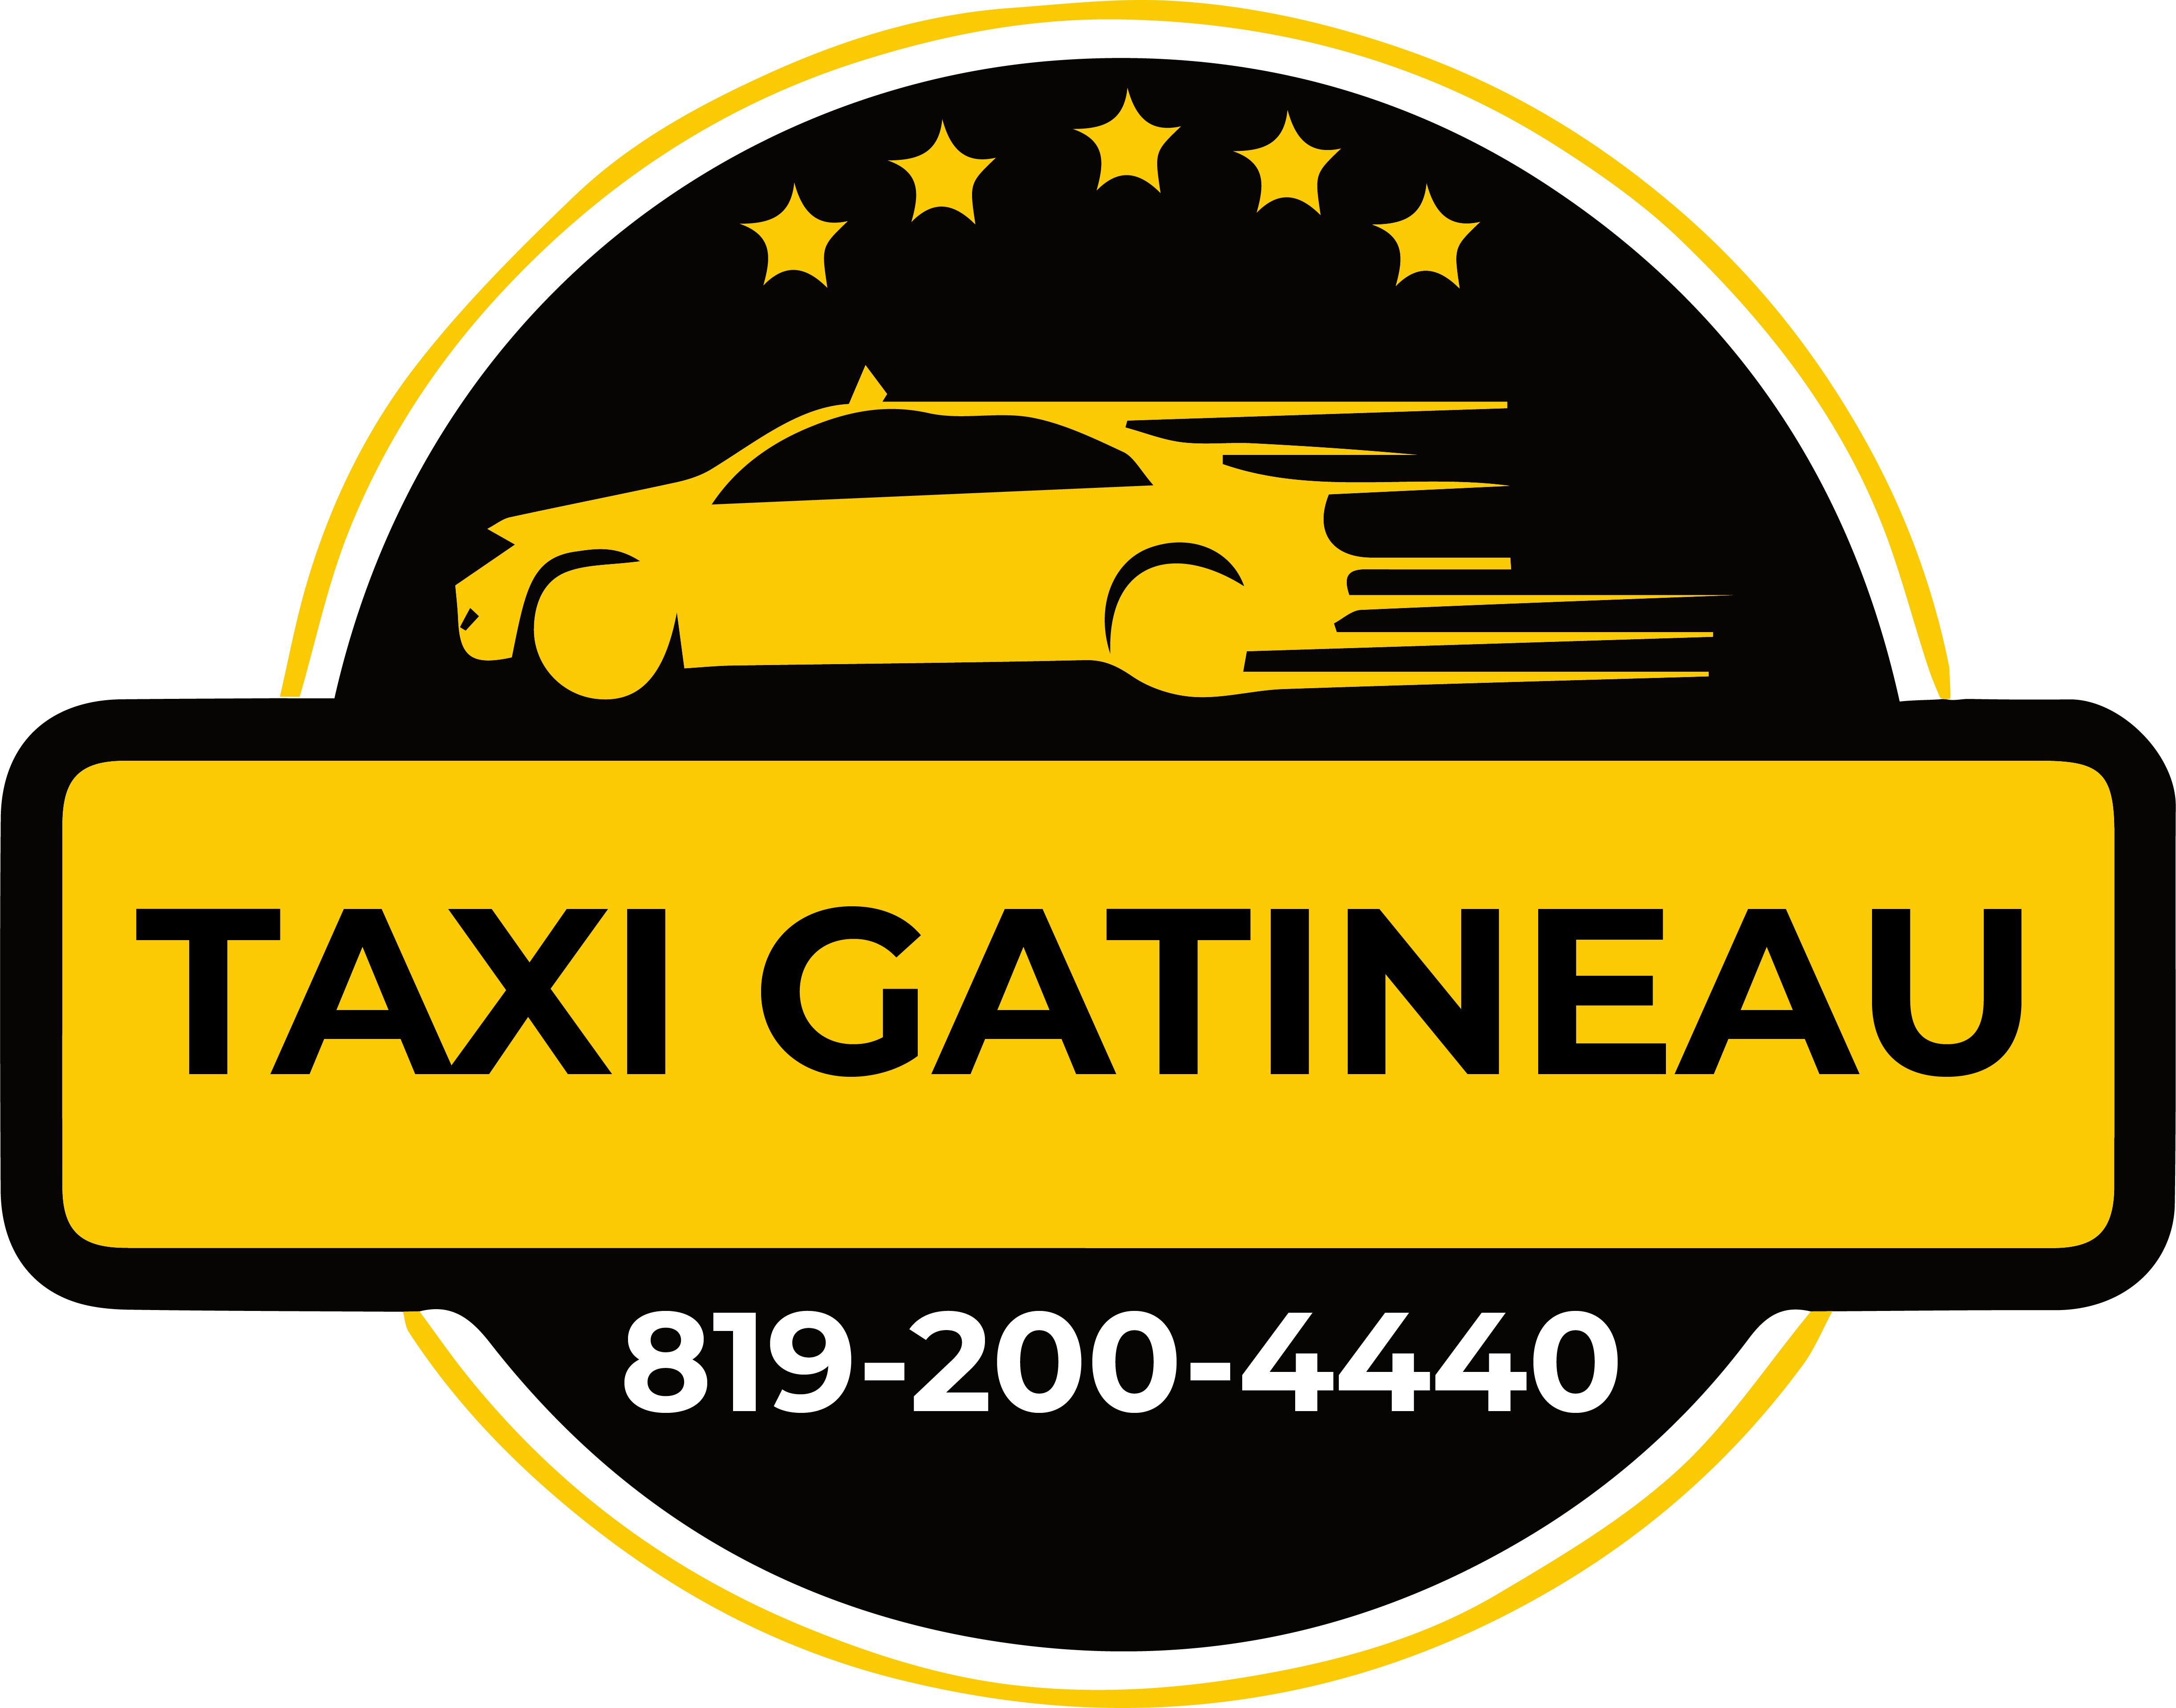 Taxi Gatineau